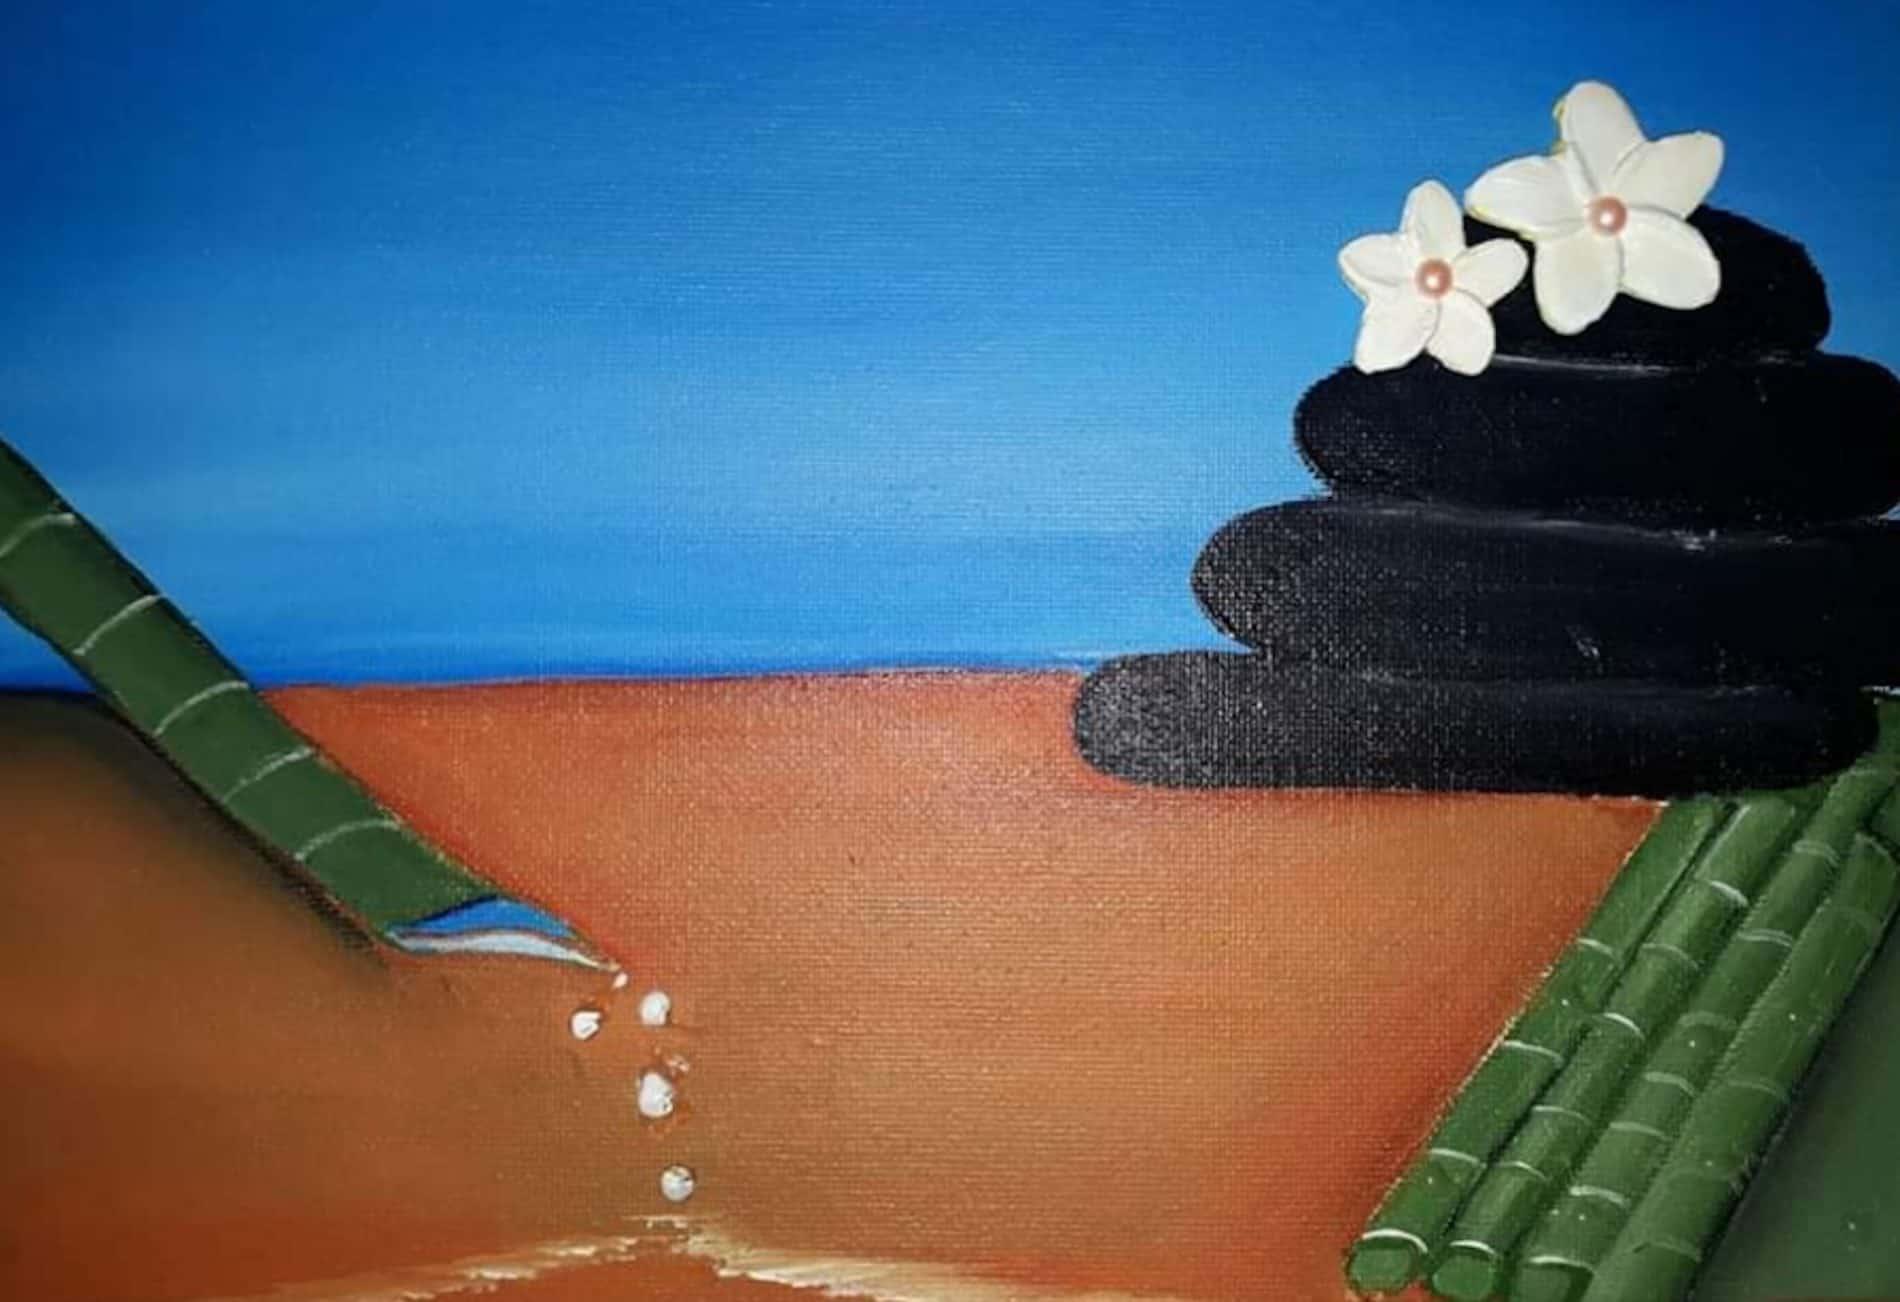 mauritius_arts_juliana_jean_tropical_frangipane